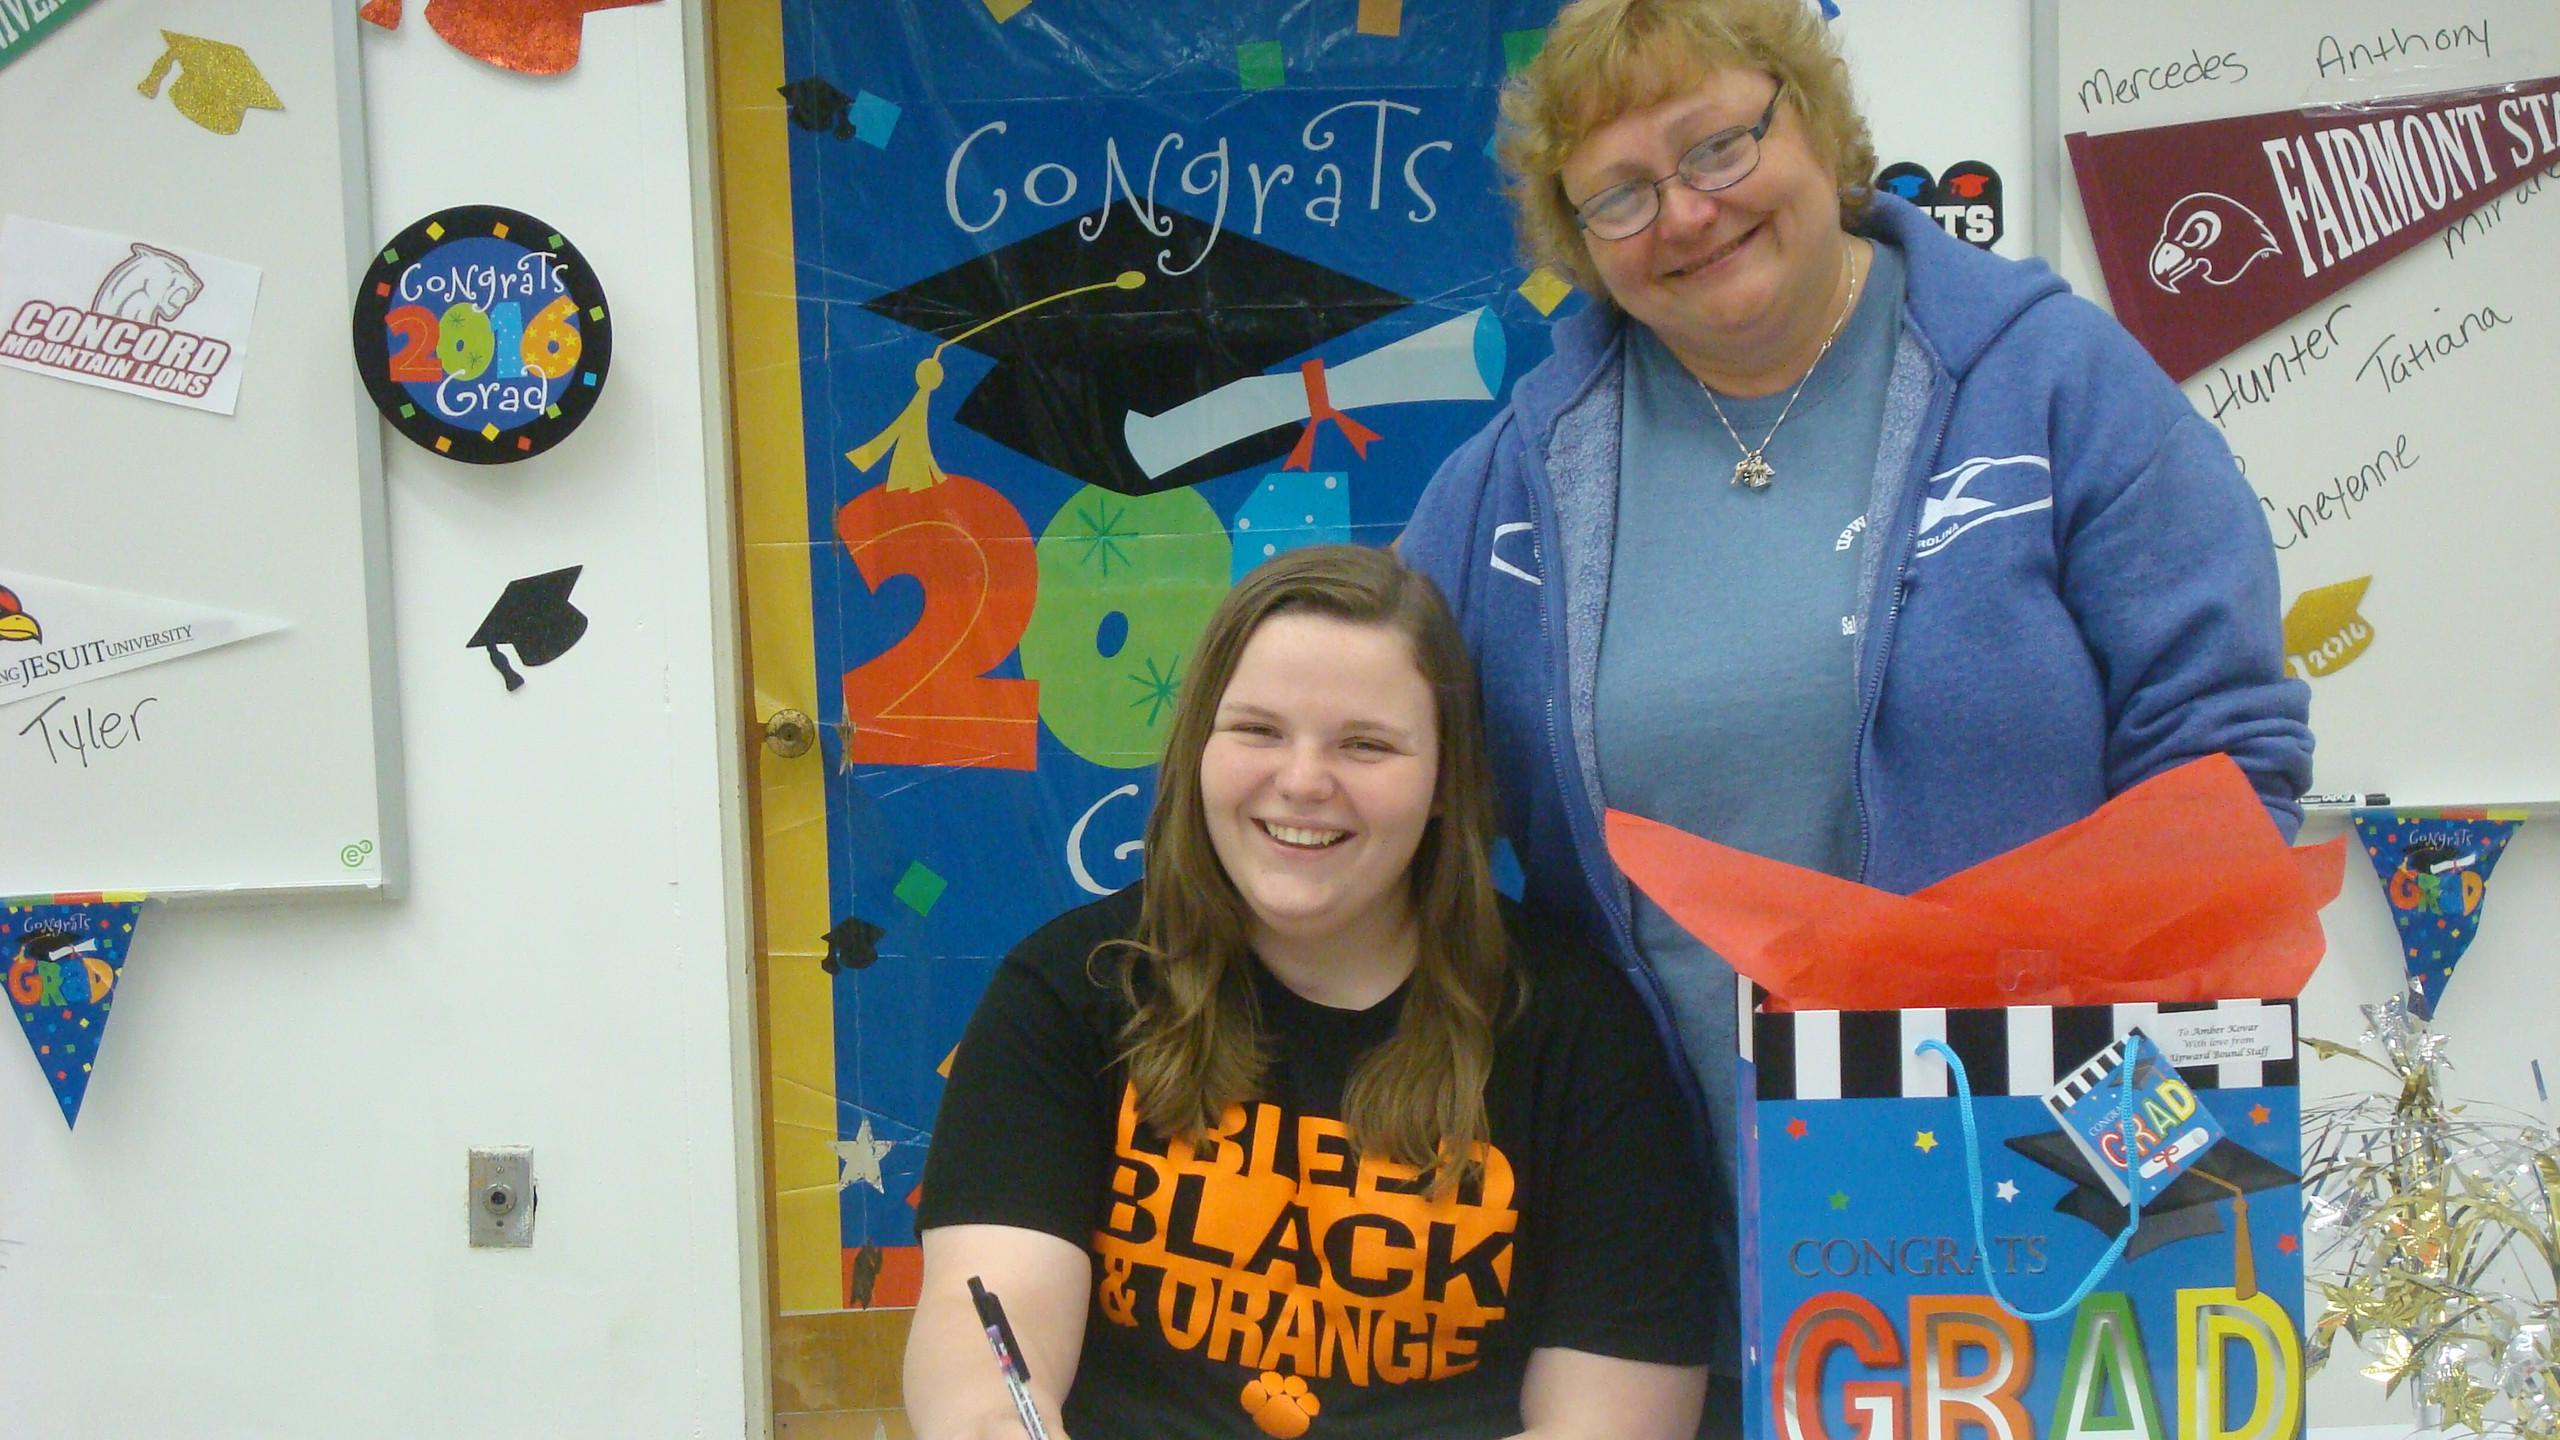 Amber will be attending West Virginia Wesleyan College